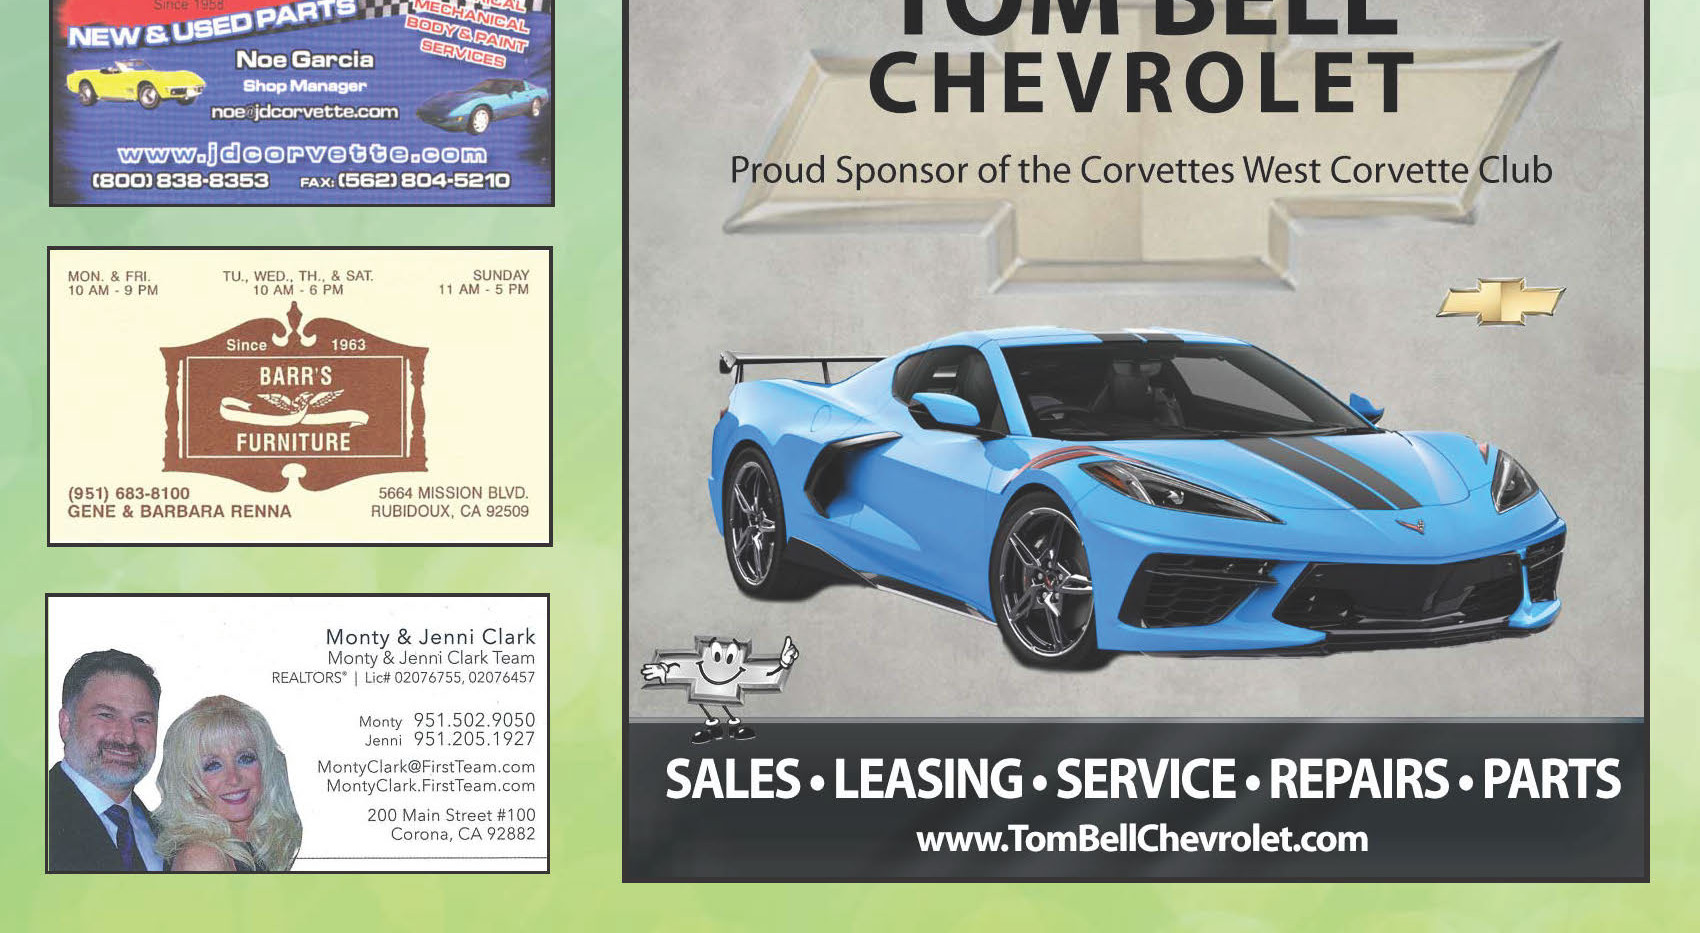 corvettes west news 421_Page_9.jpg